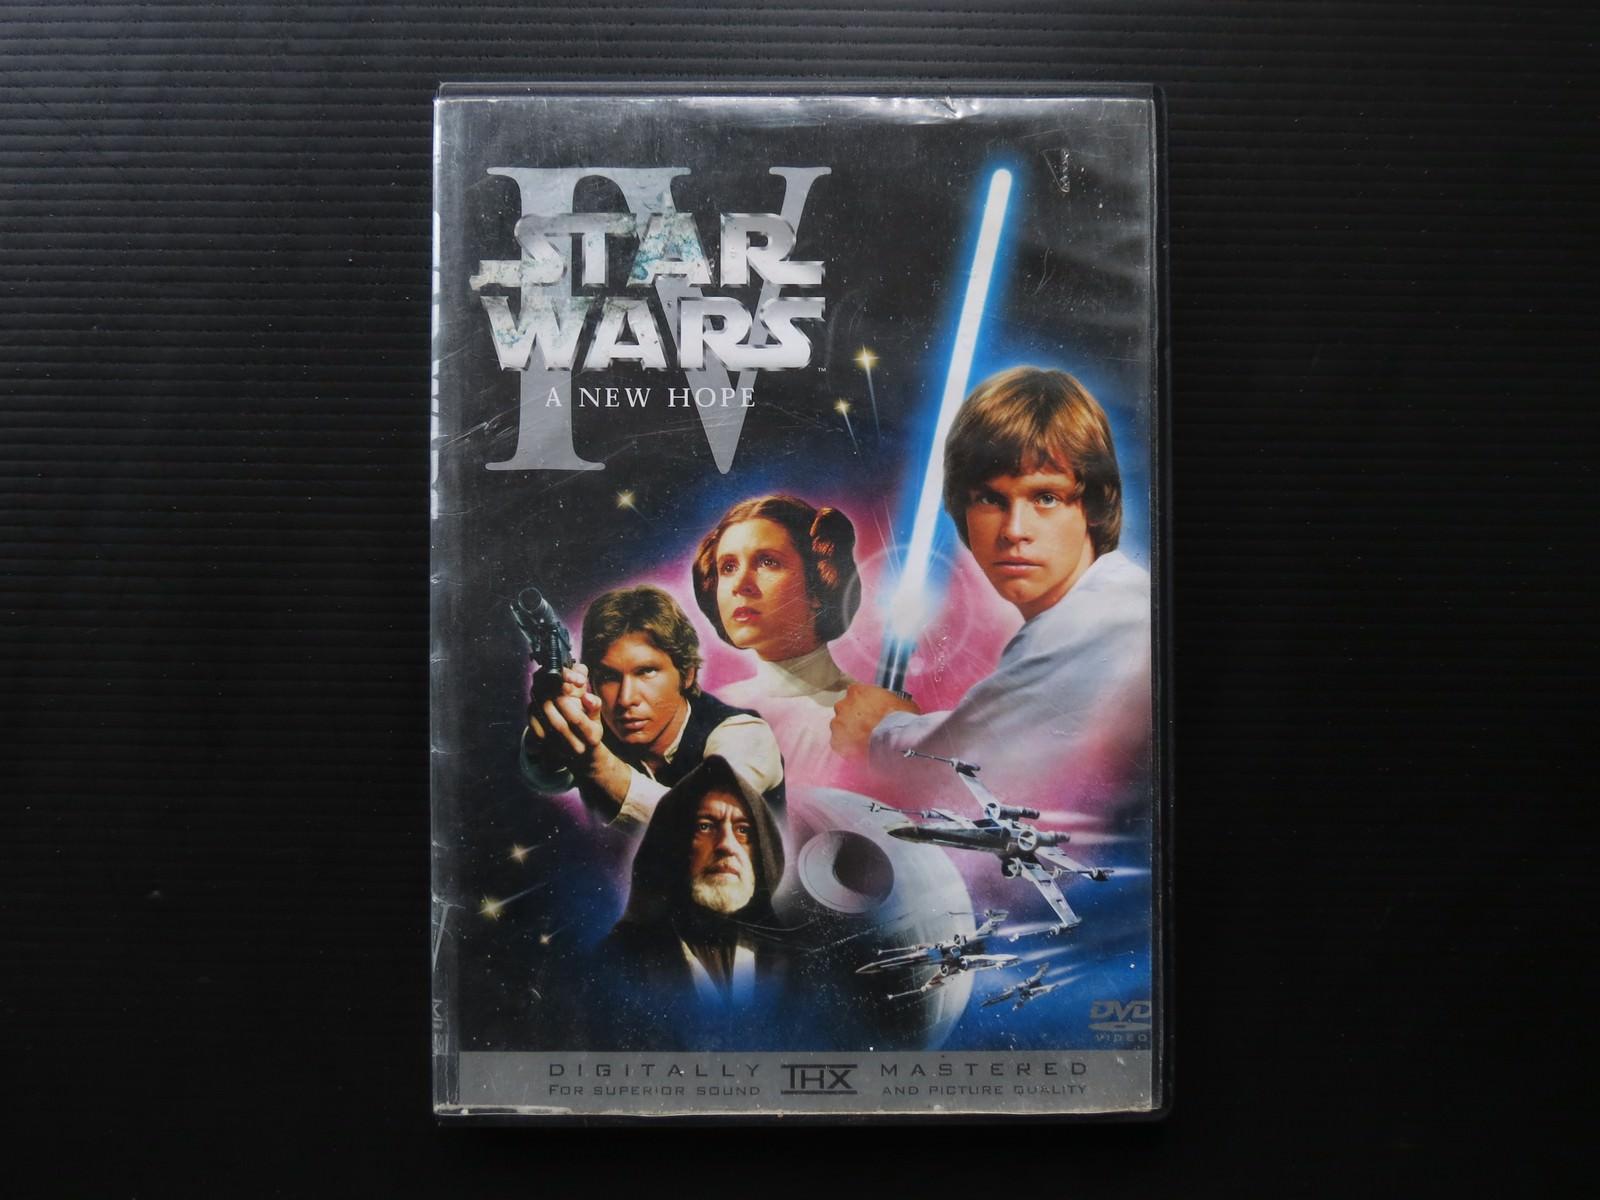 Movie, Star Wars Episode IV: A New Hope(美國, 1977) / 星際大戰四部曲:曙光乍現(台灣) / 星球大战IV:新希望(中國) / 星球大戰:新的希望(香港), 電影DVD